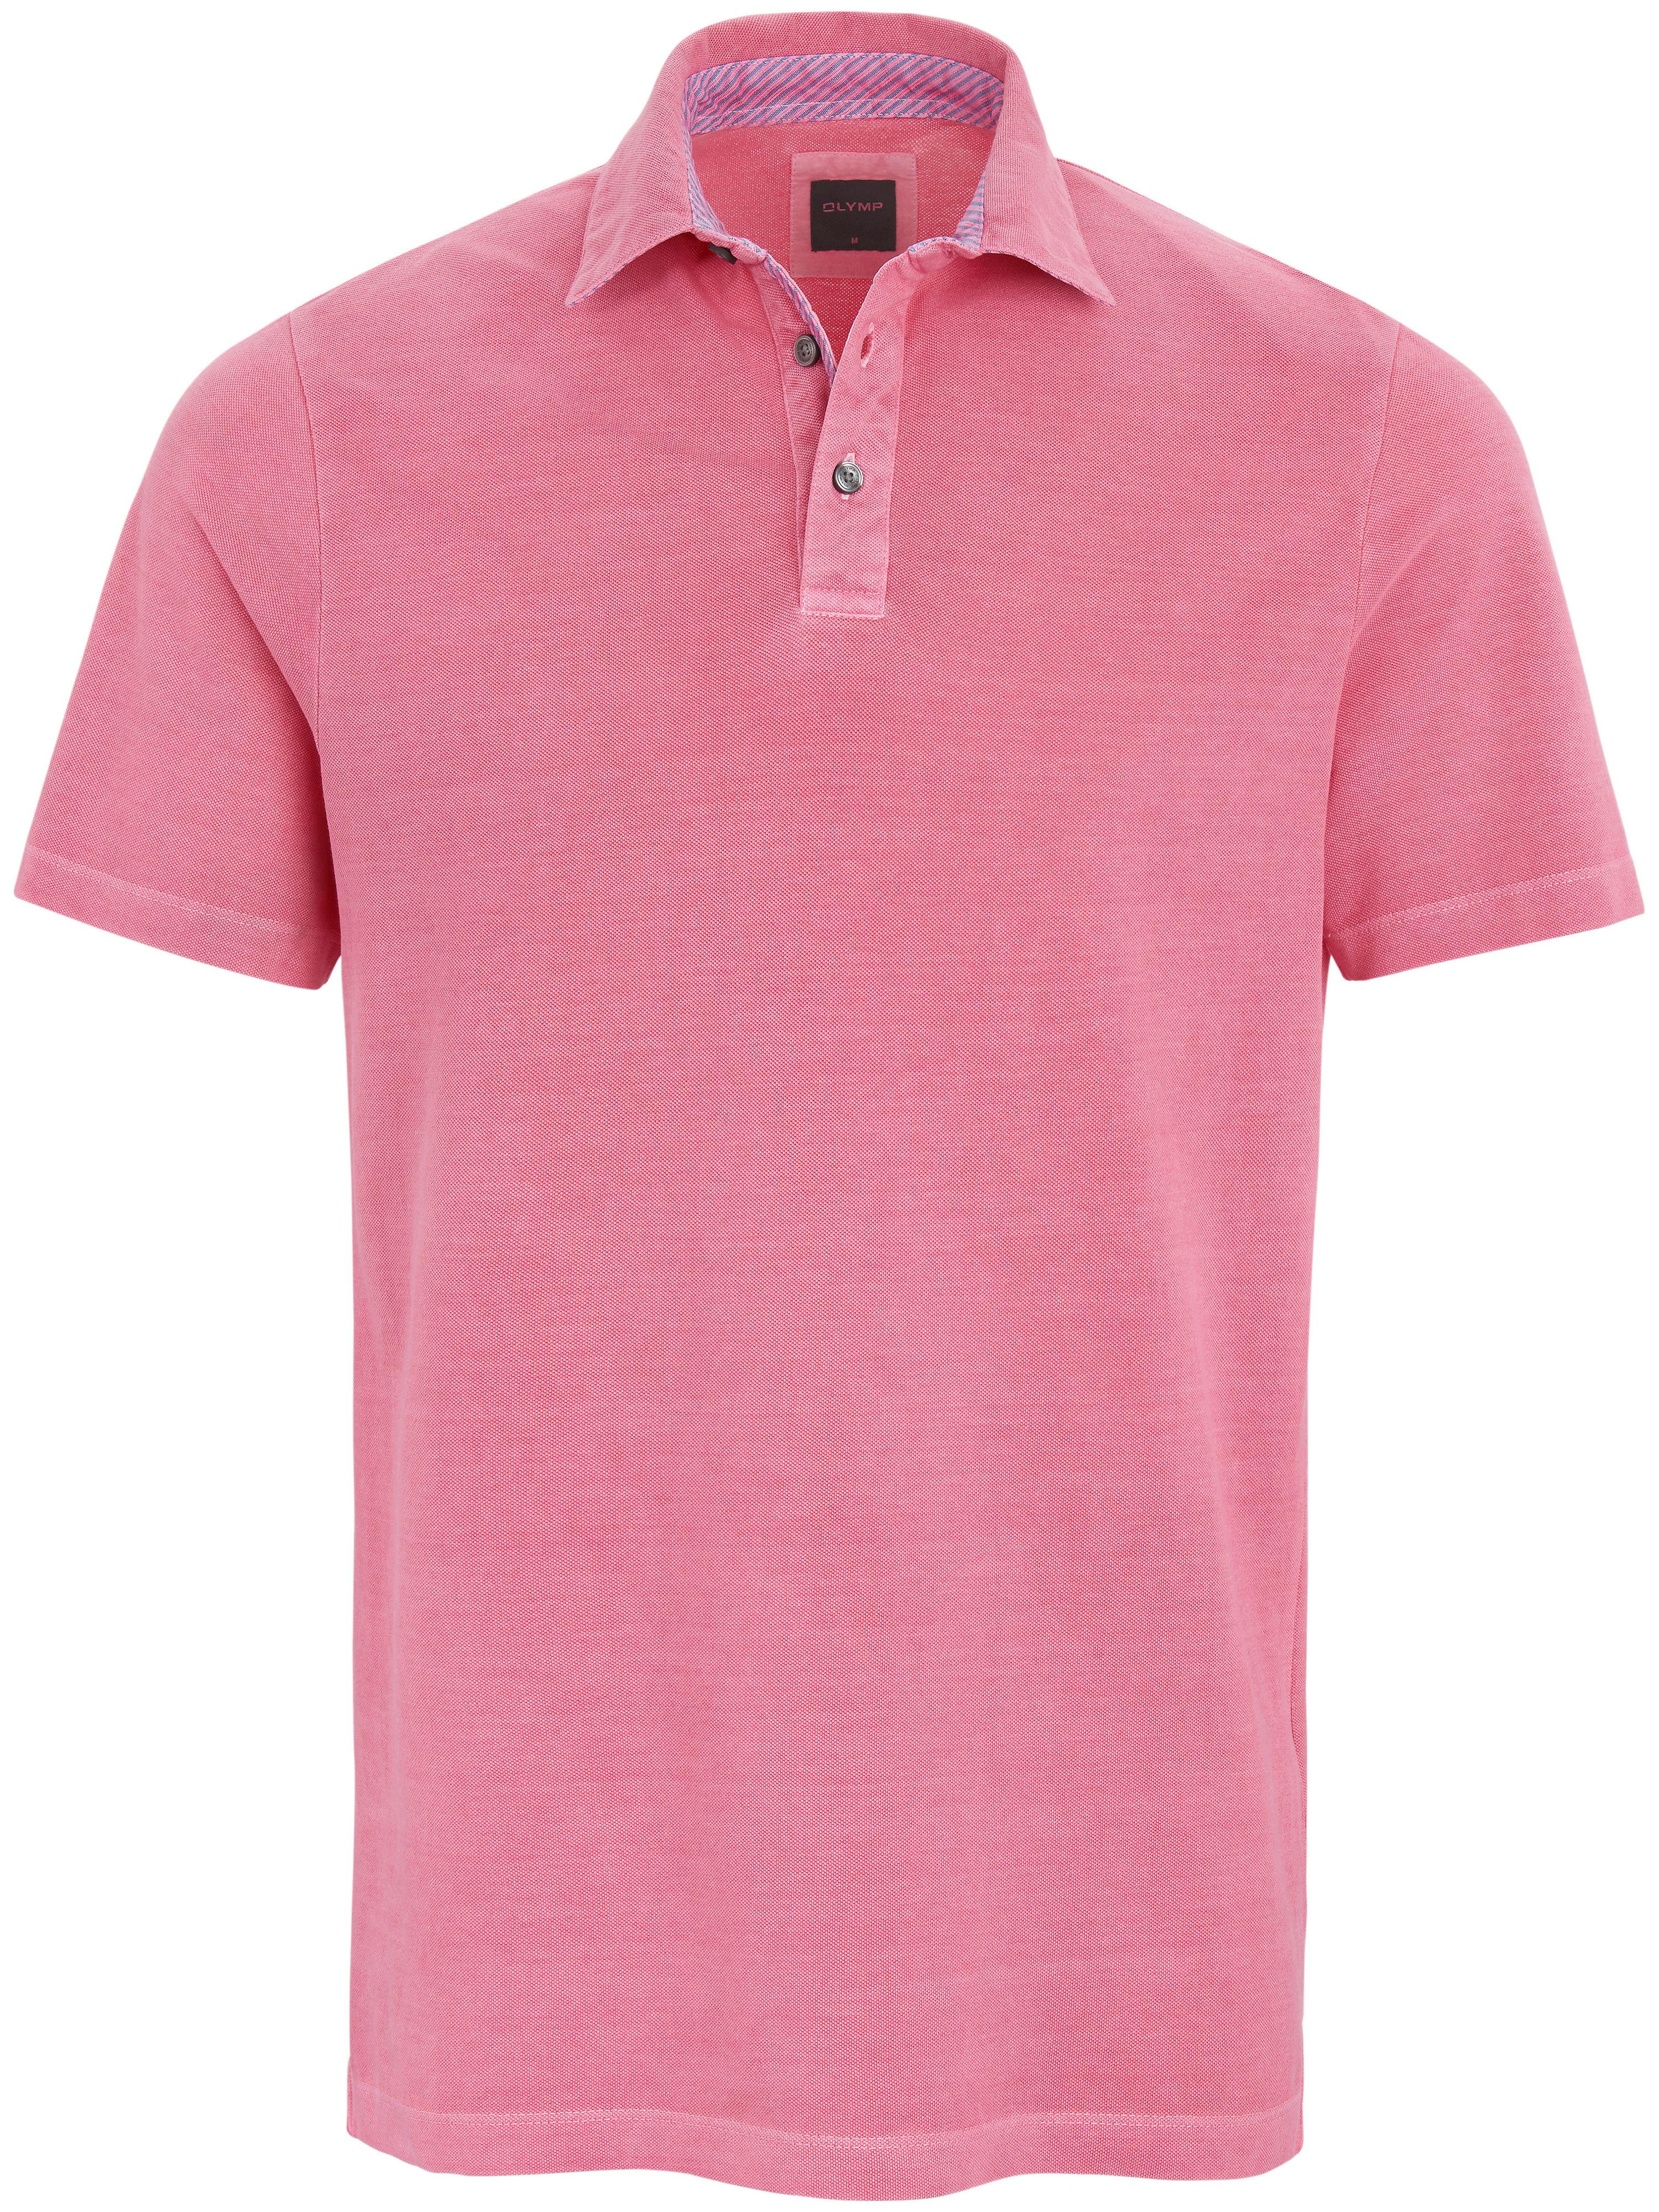 Polo-Shirt 1/2-Arm Olymp pink Größe: 56